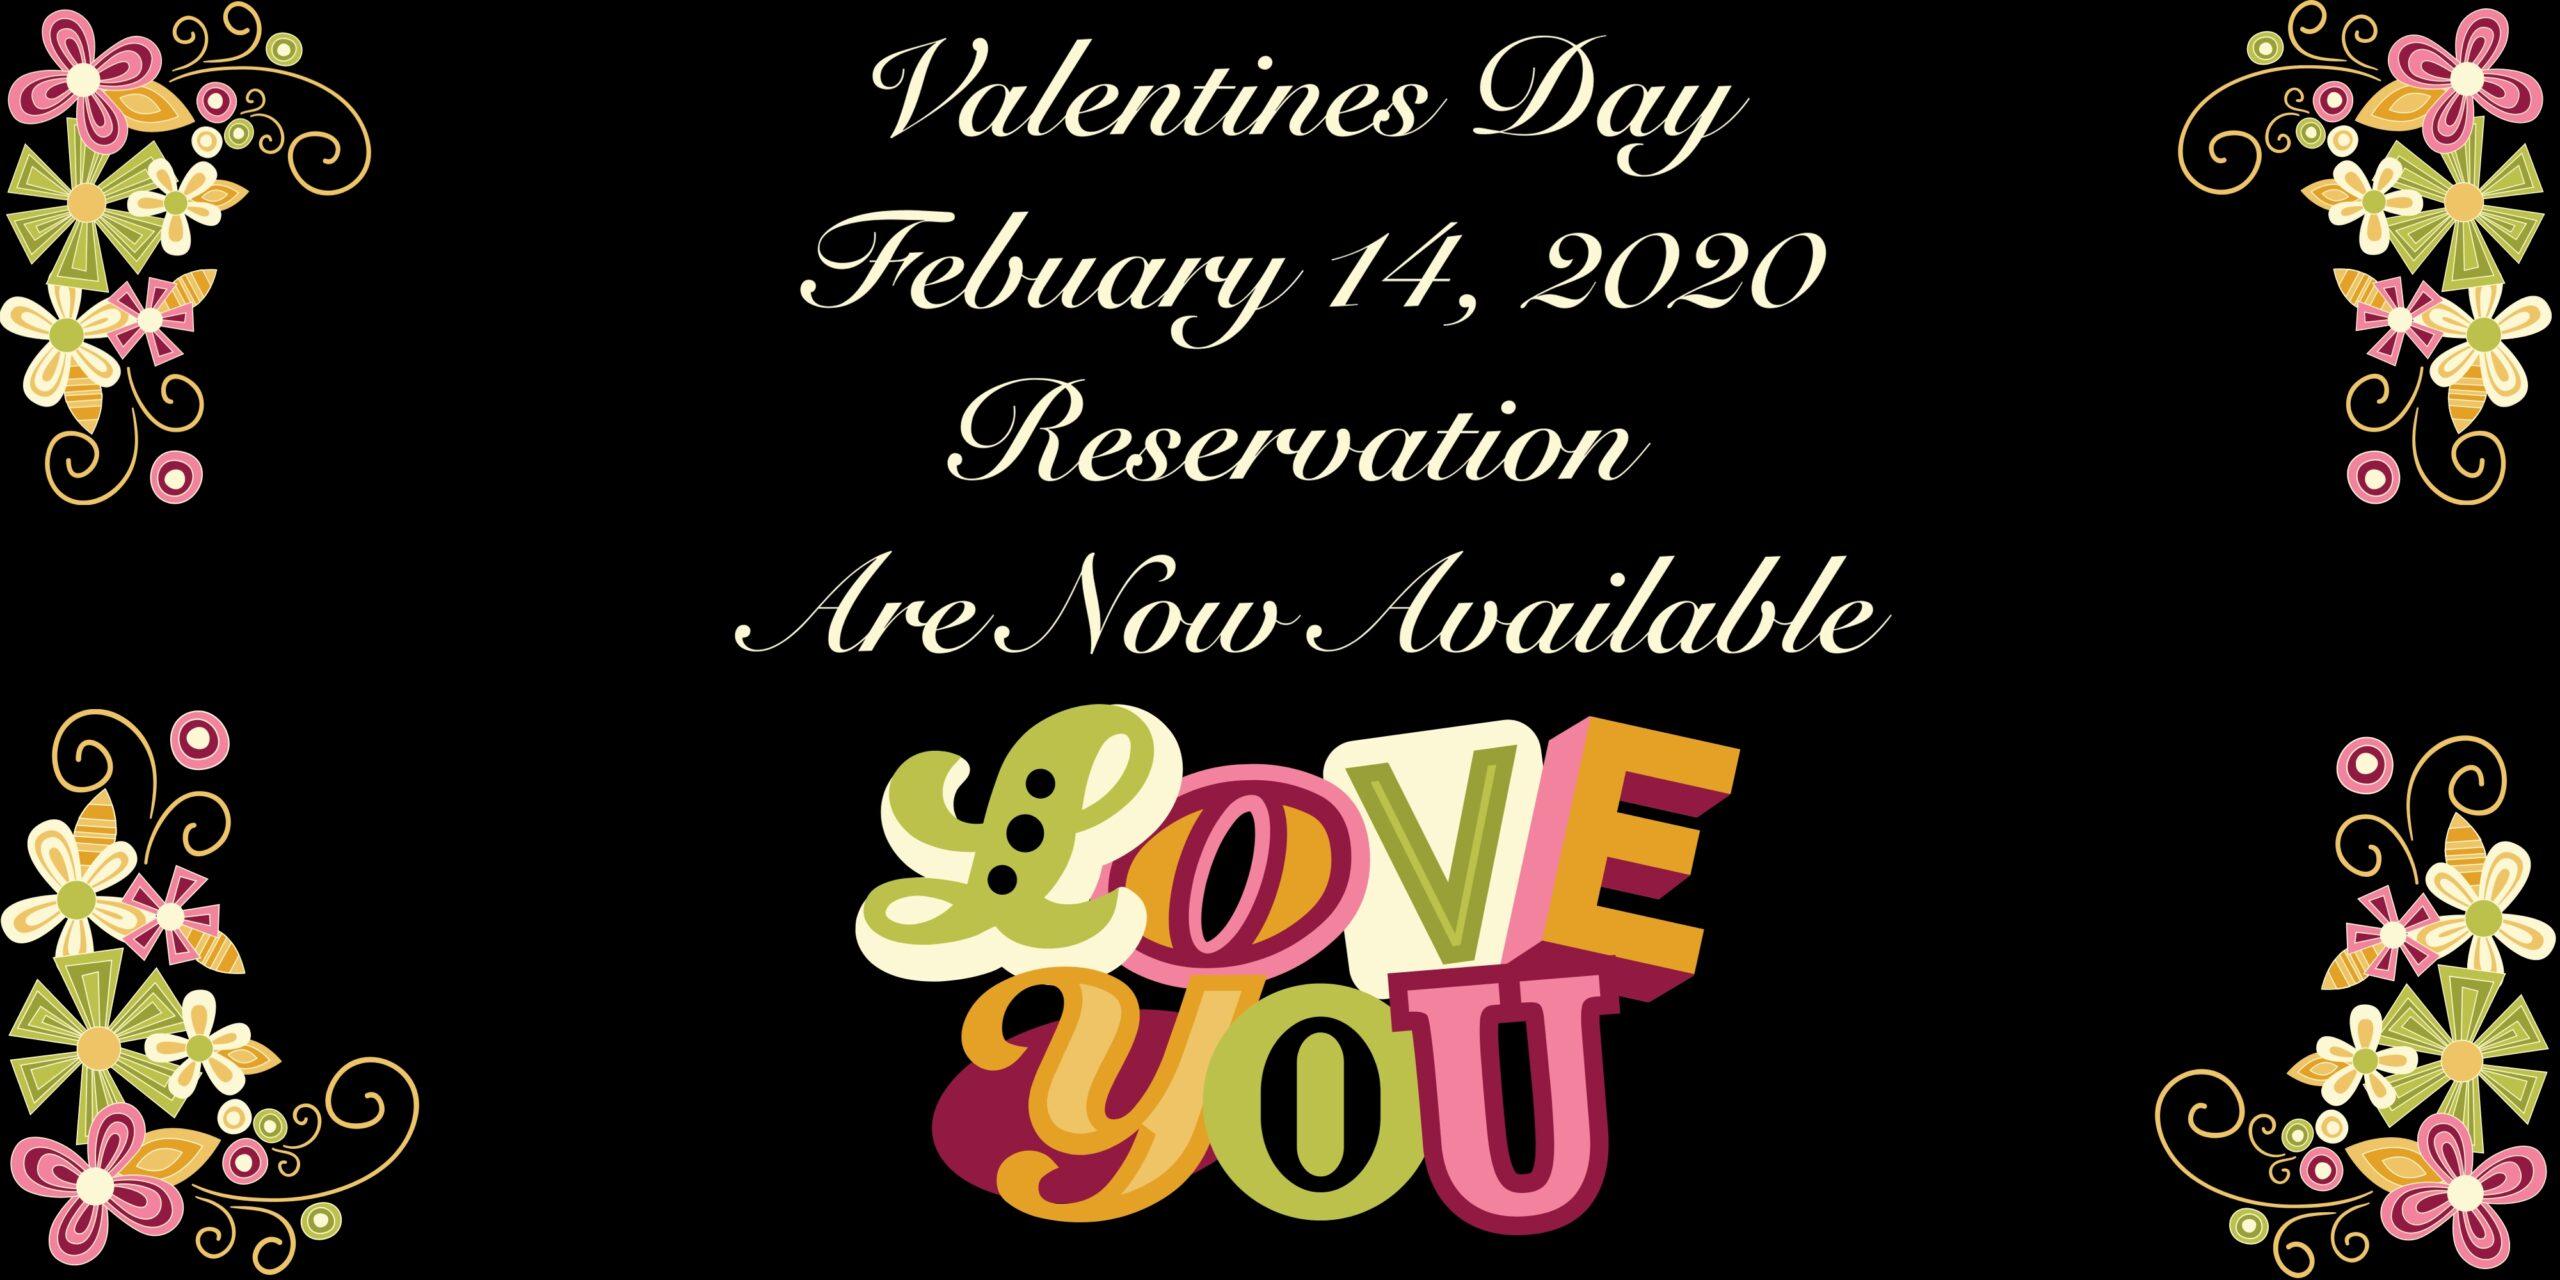 Valentines Day Dinner !!!!! 2020